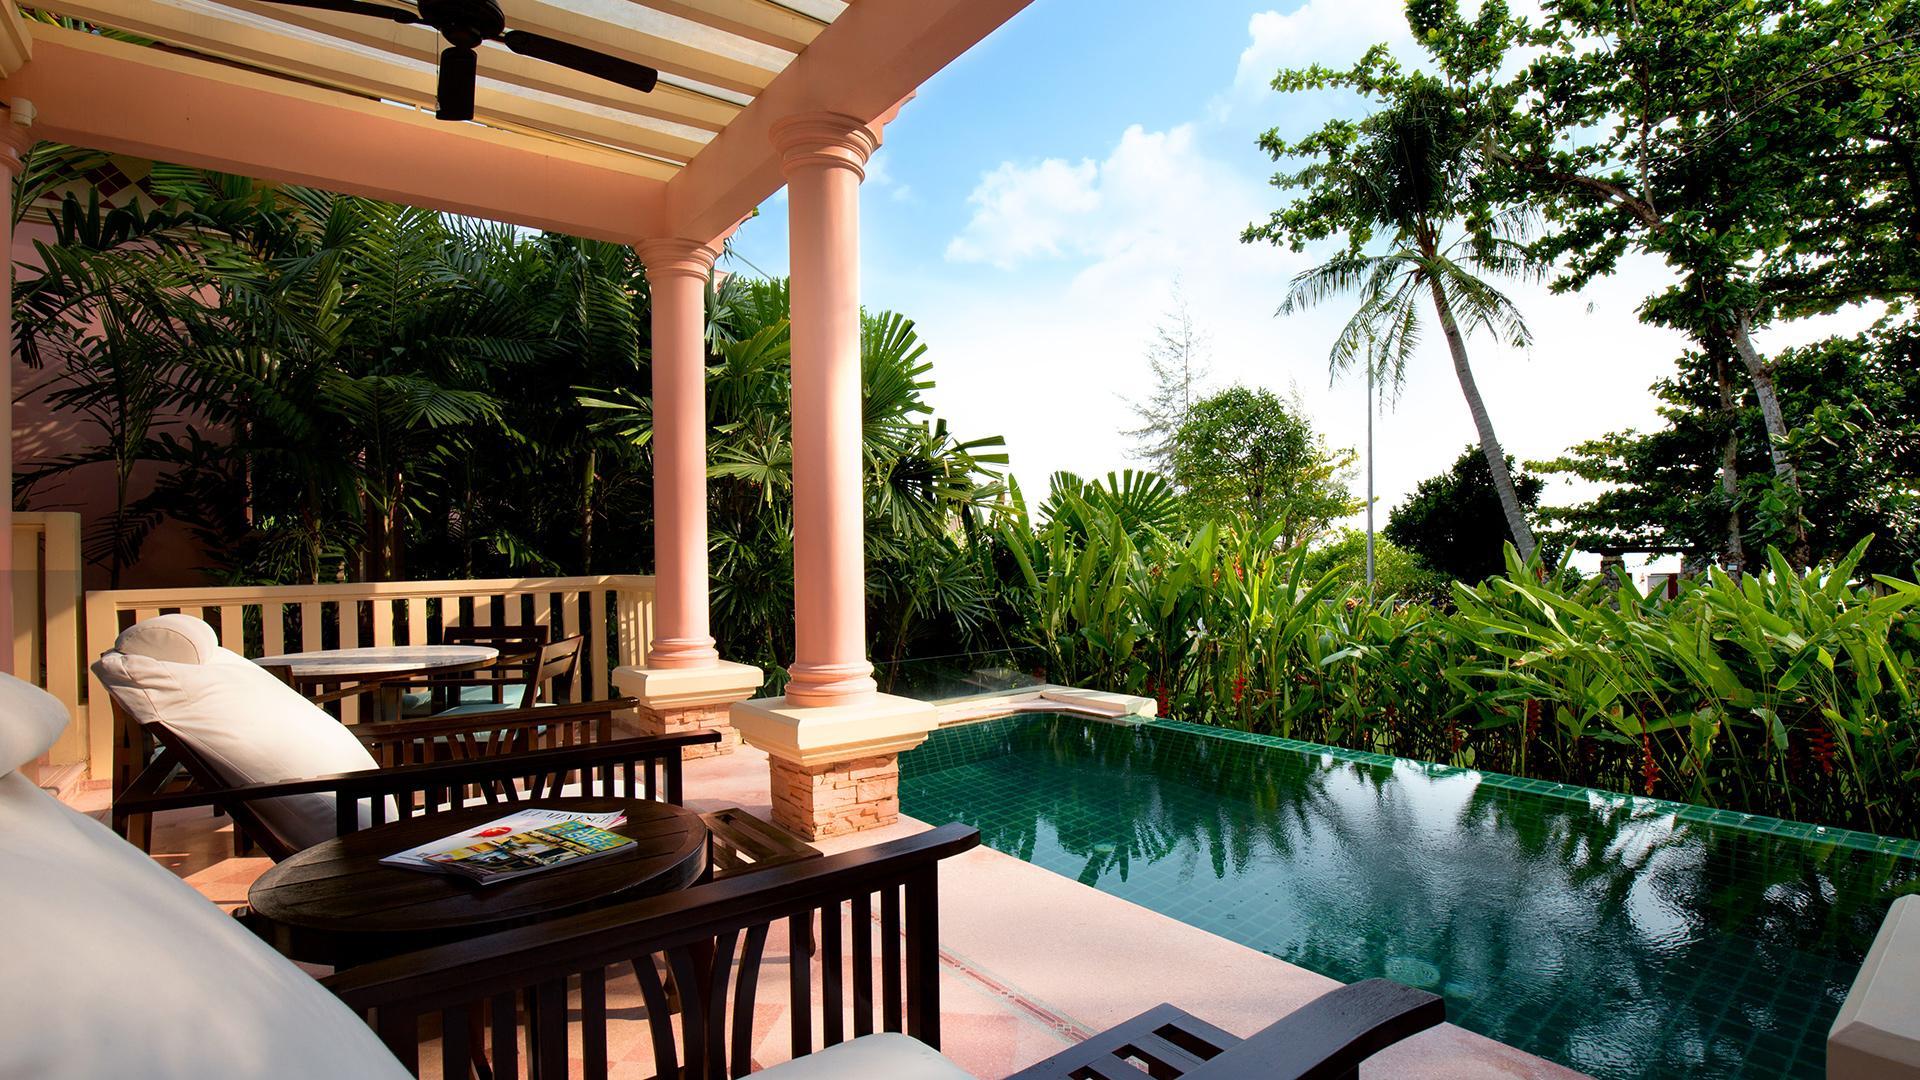 One Bedroom Pool Villa image 1 at Centara Grand Beach Resort Phuket by อำเภอเมืองภูเก็ต, Phuket, Thailand